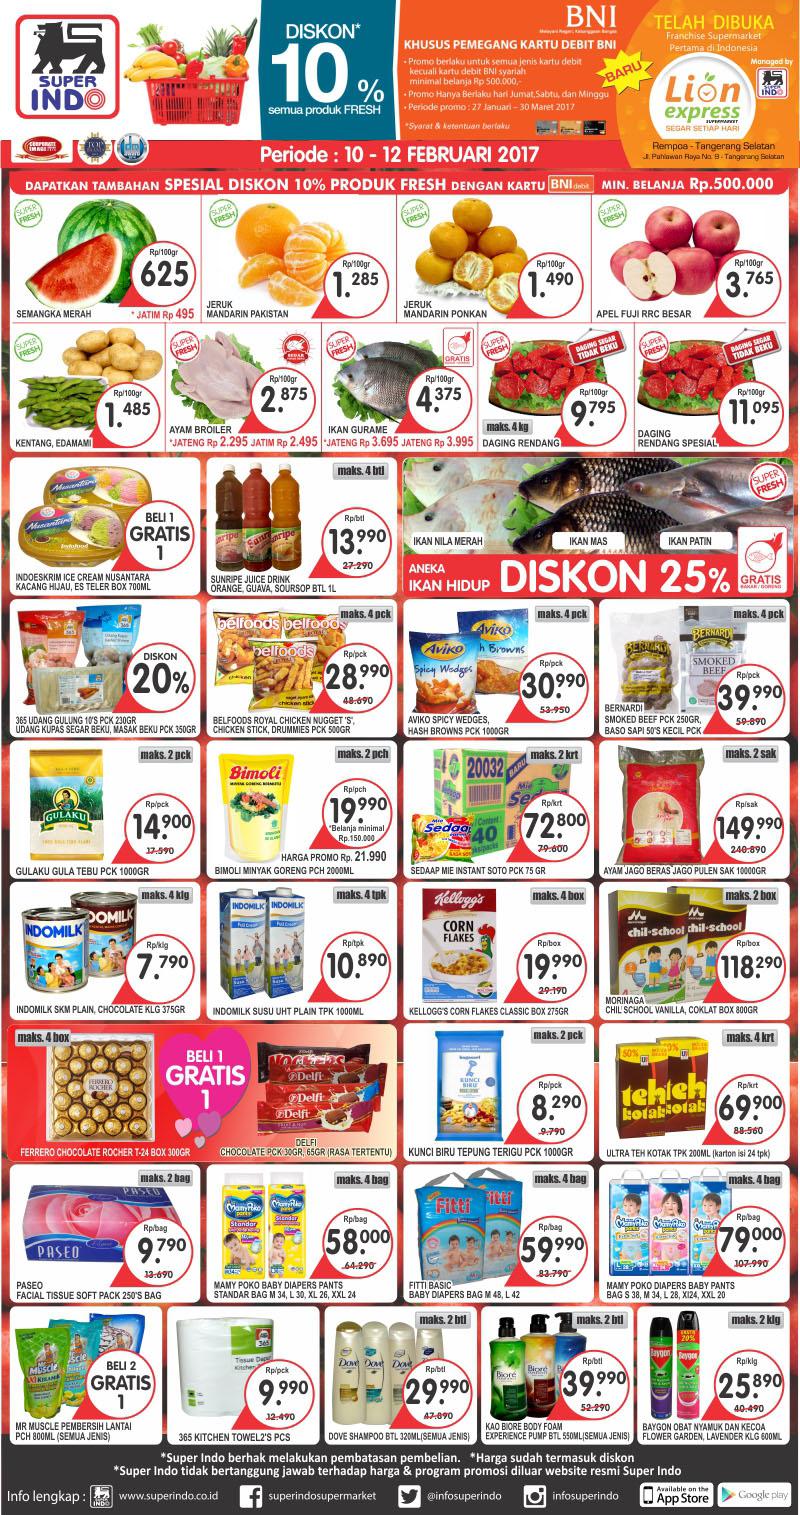 Katalog Promo Nusantara Hari Hari Pasar Swalayan Kjsm 9 12